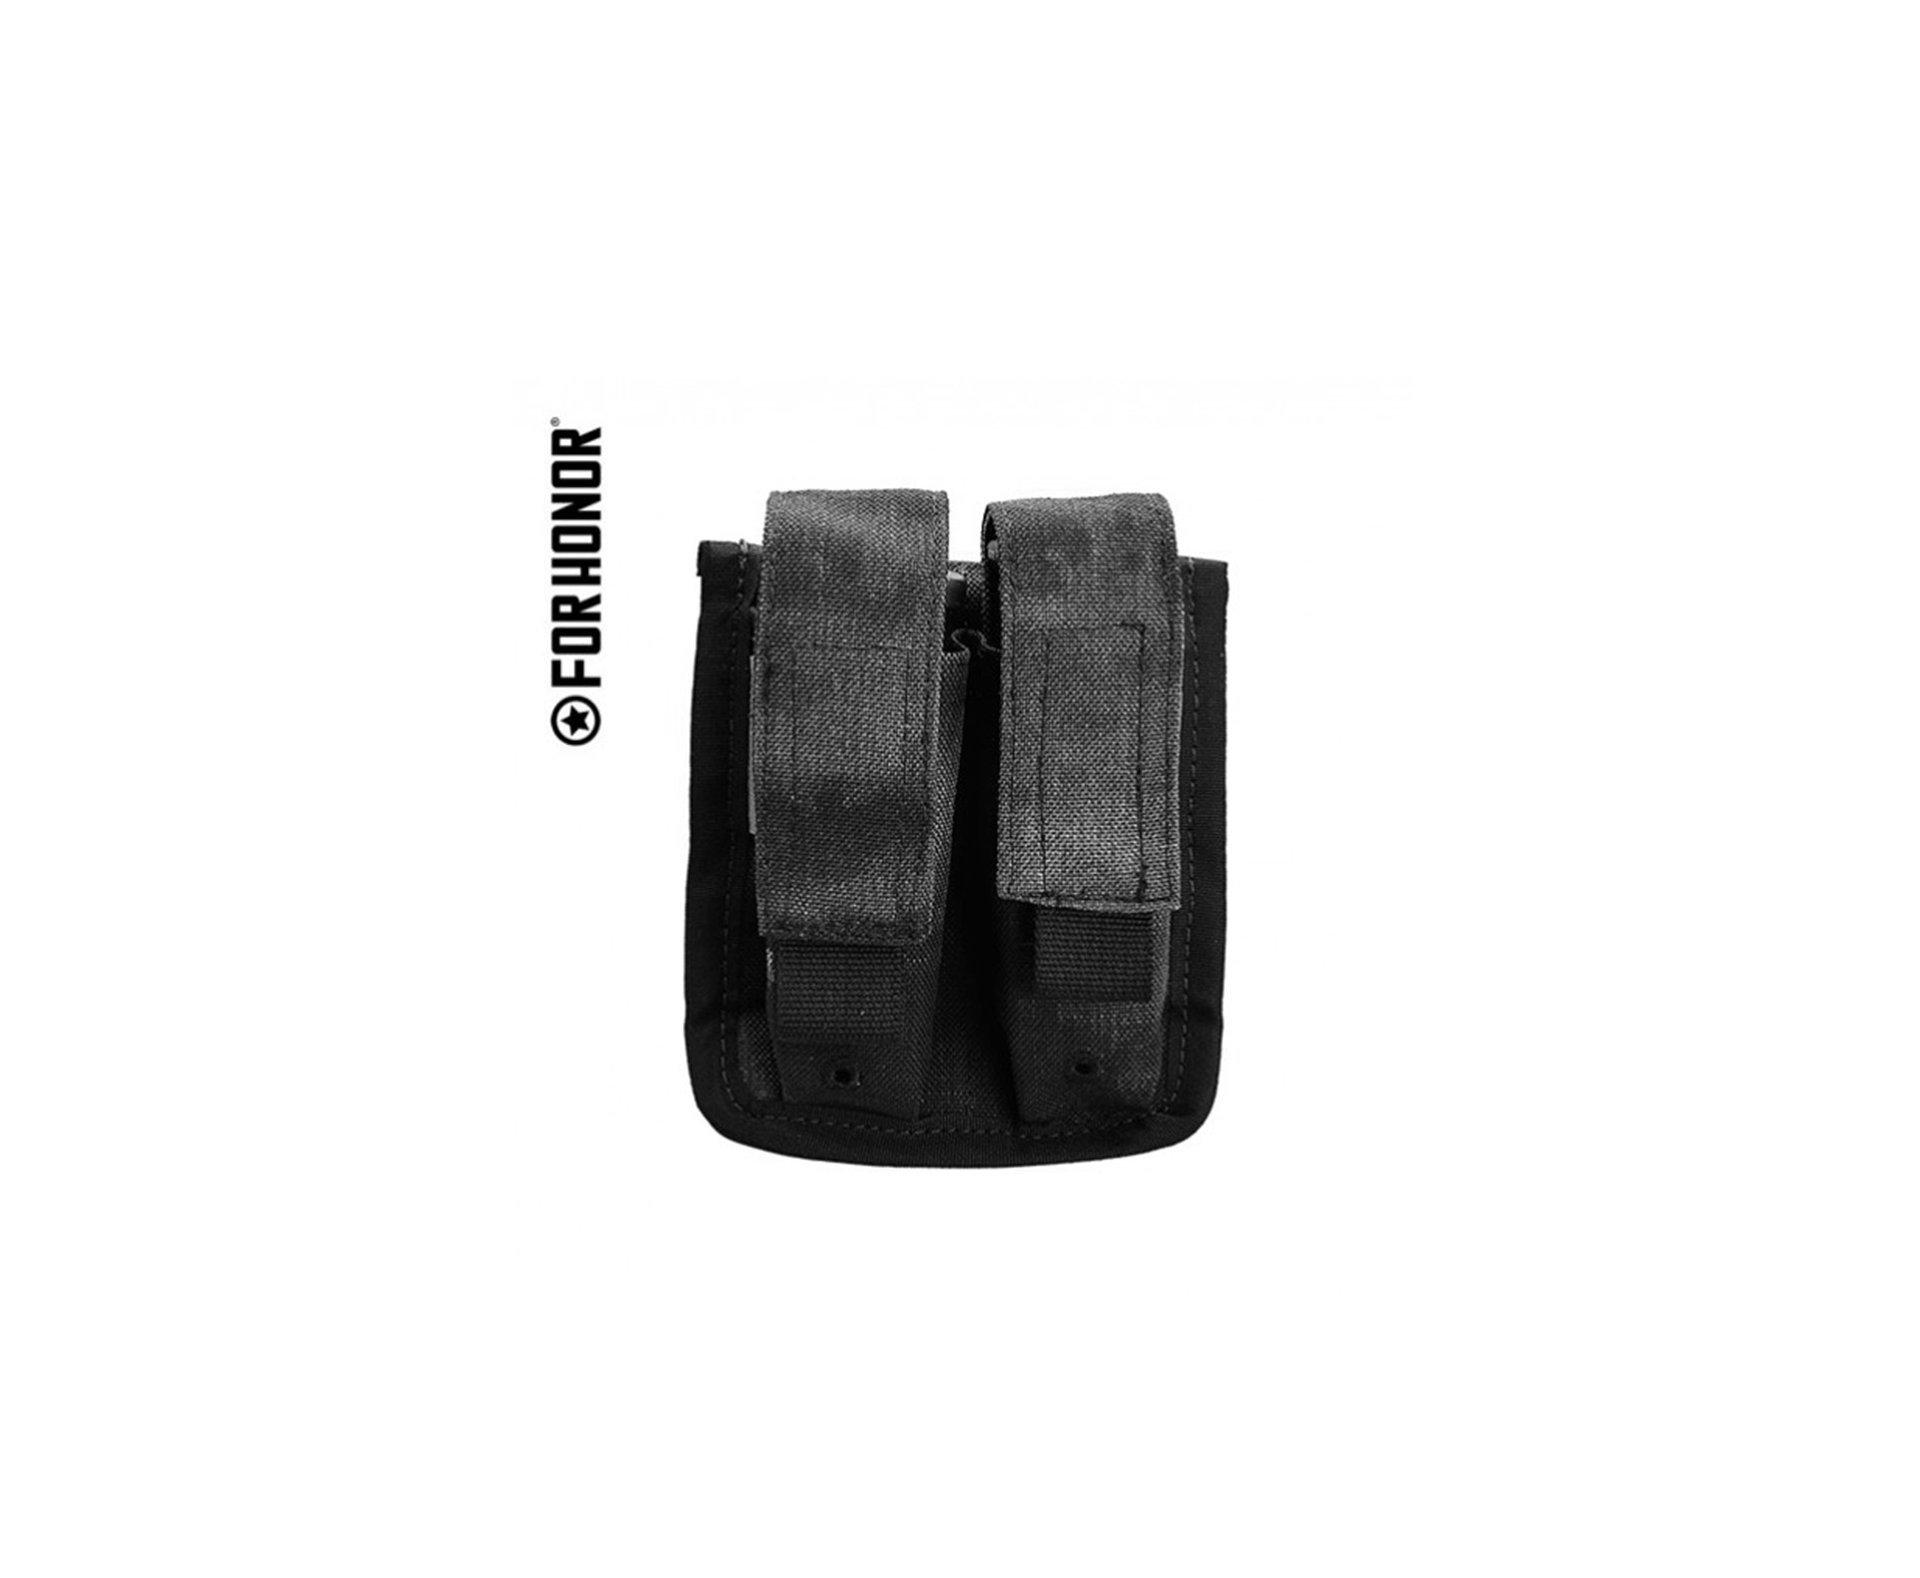 Porta Carregador Pistola Duplo Forhonor Em Cordura 1000 Black